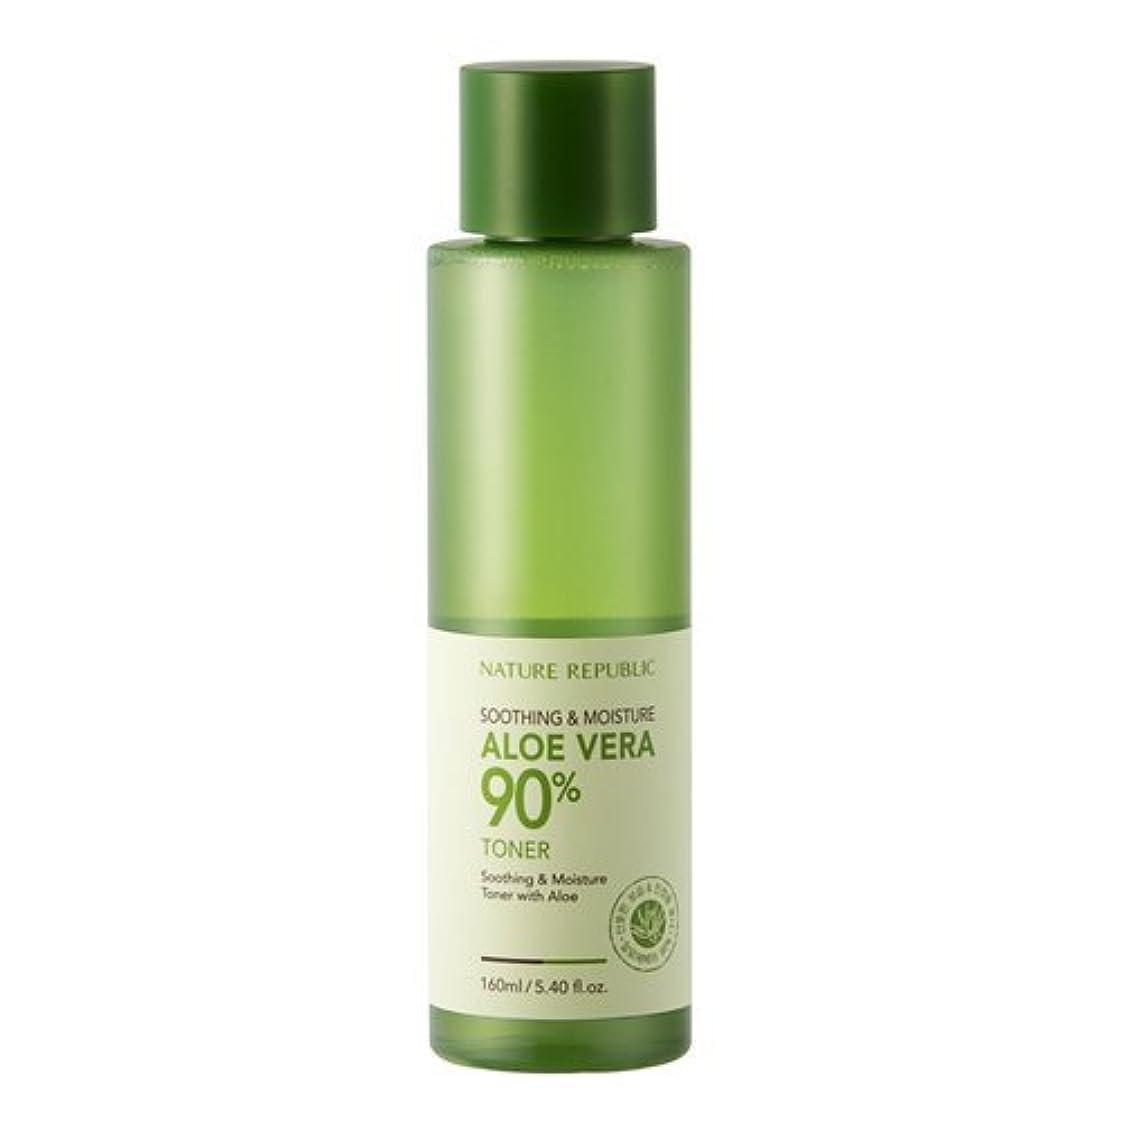 比率森林亜熱帯Nature Republic Soothing & Moisture Aloe Vera 90% Toner 160ml